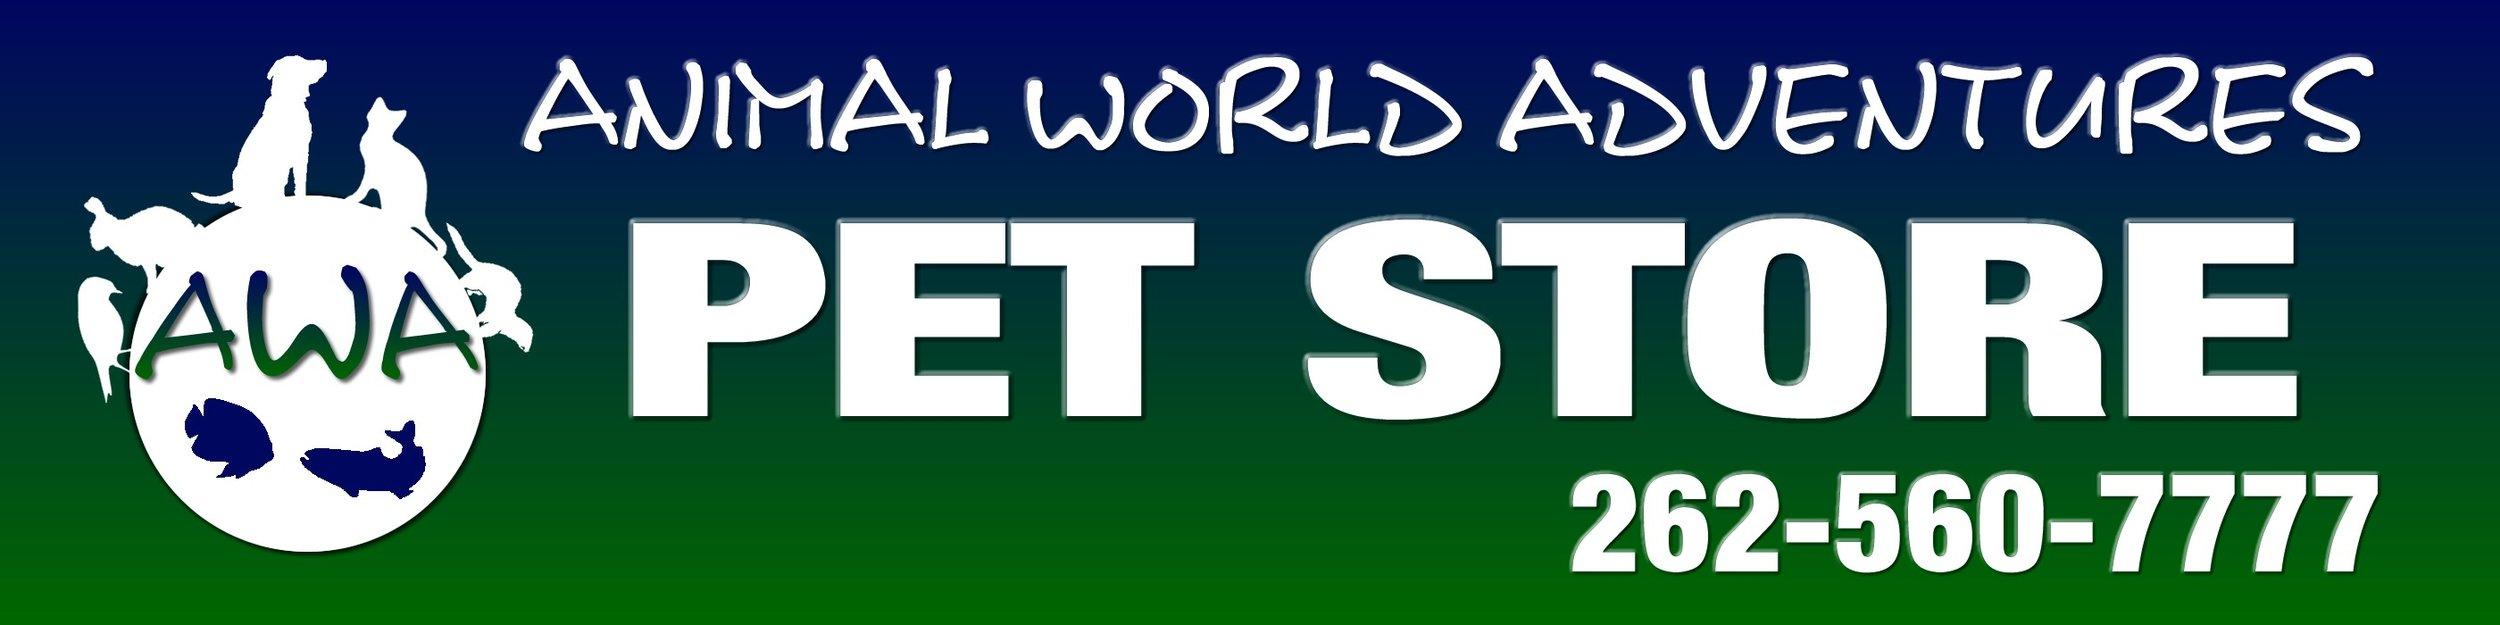 www.animalworldadventurespetstore.com